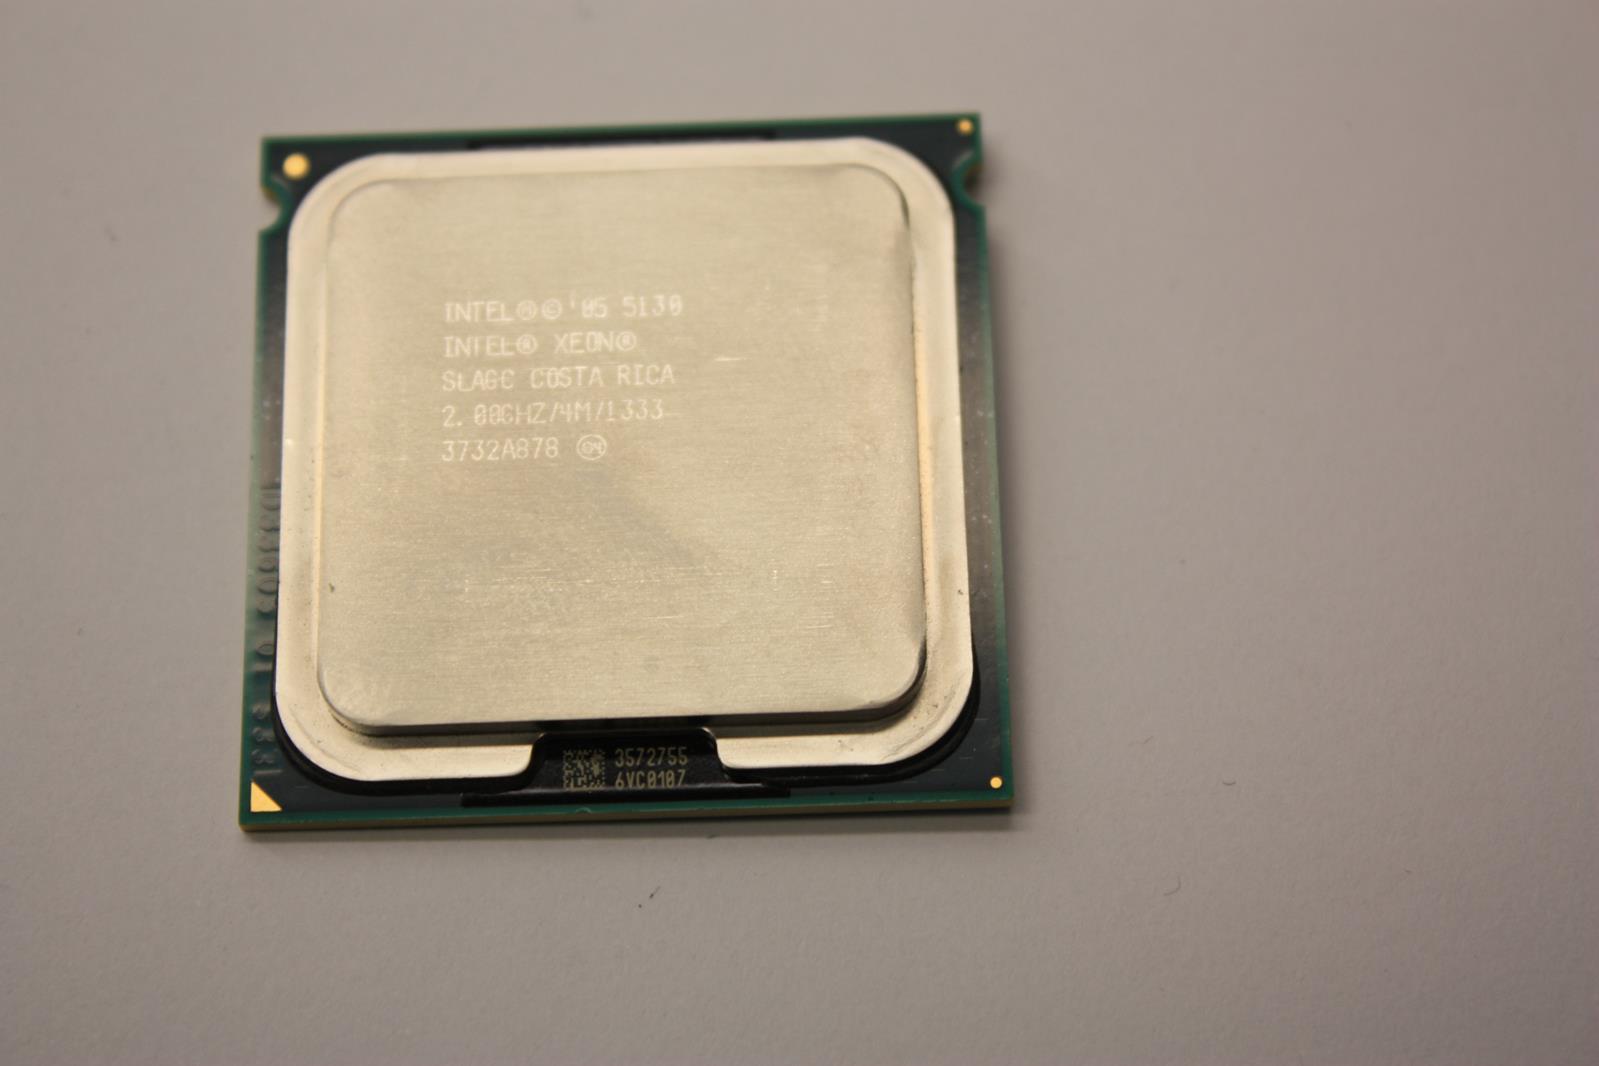 Genuine Intel Xeon CPU Computer Processor SLAGC 2GHZ 1333MHZ 4MB Dual Core 5130 Certified Refurbished